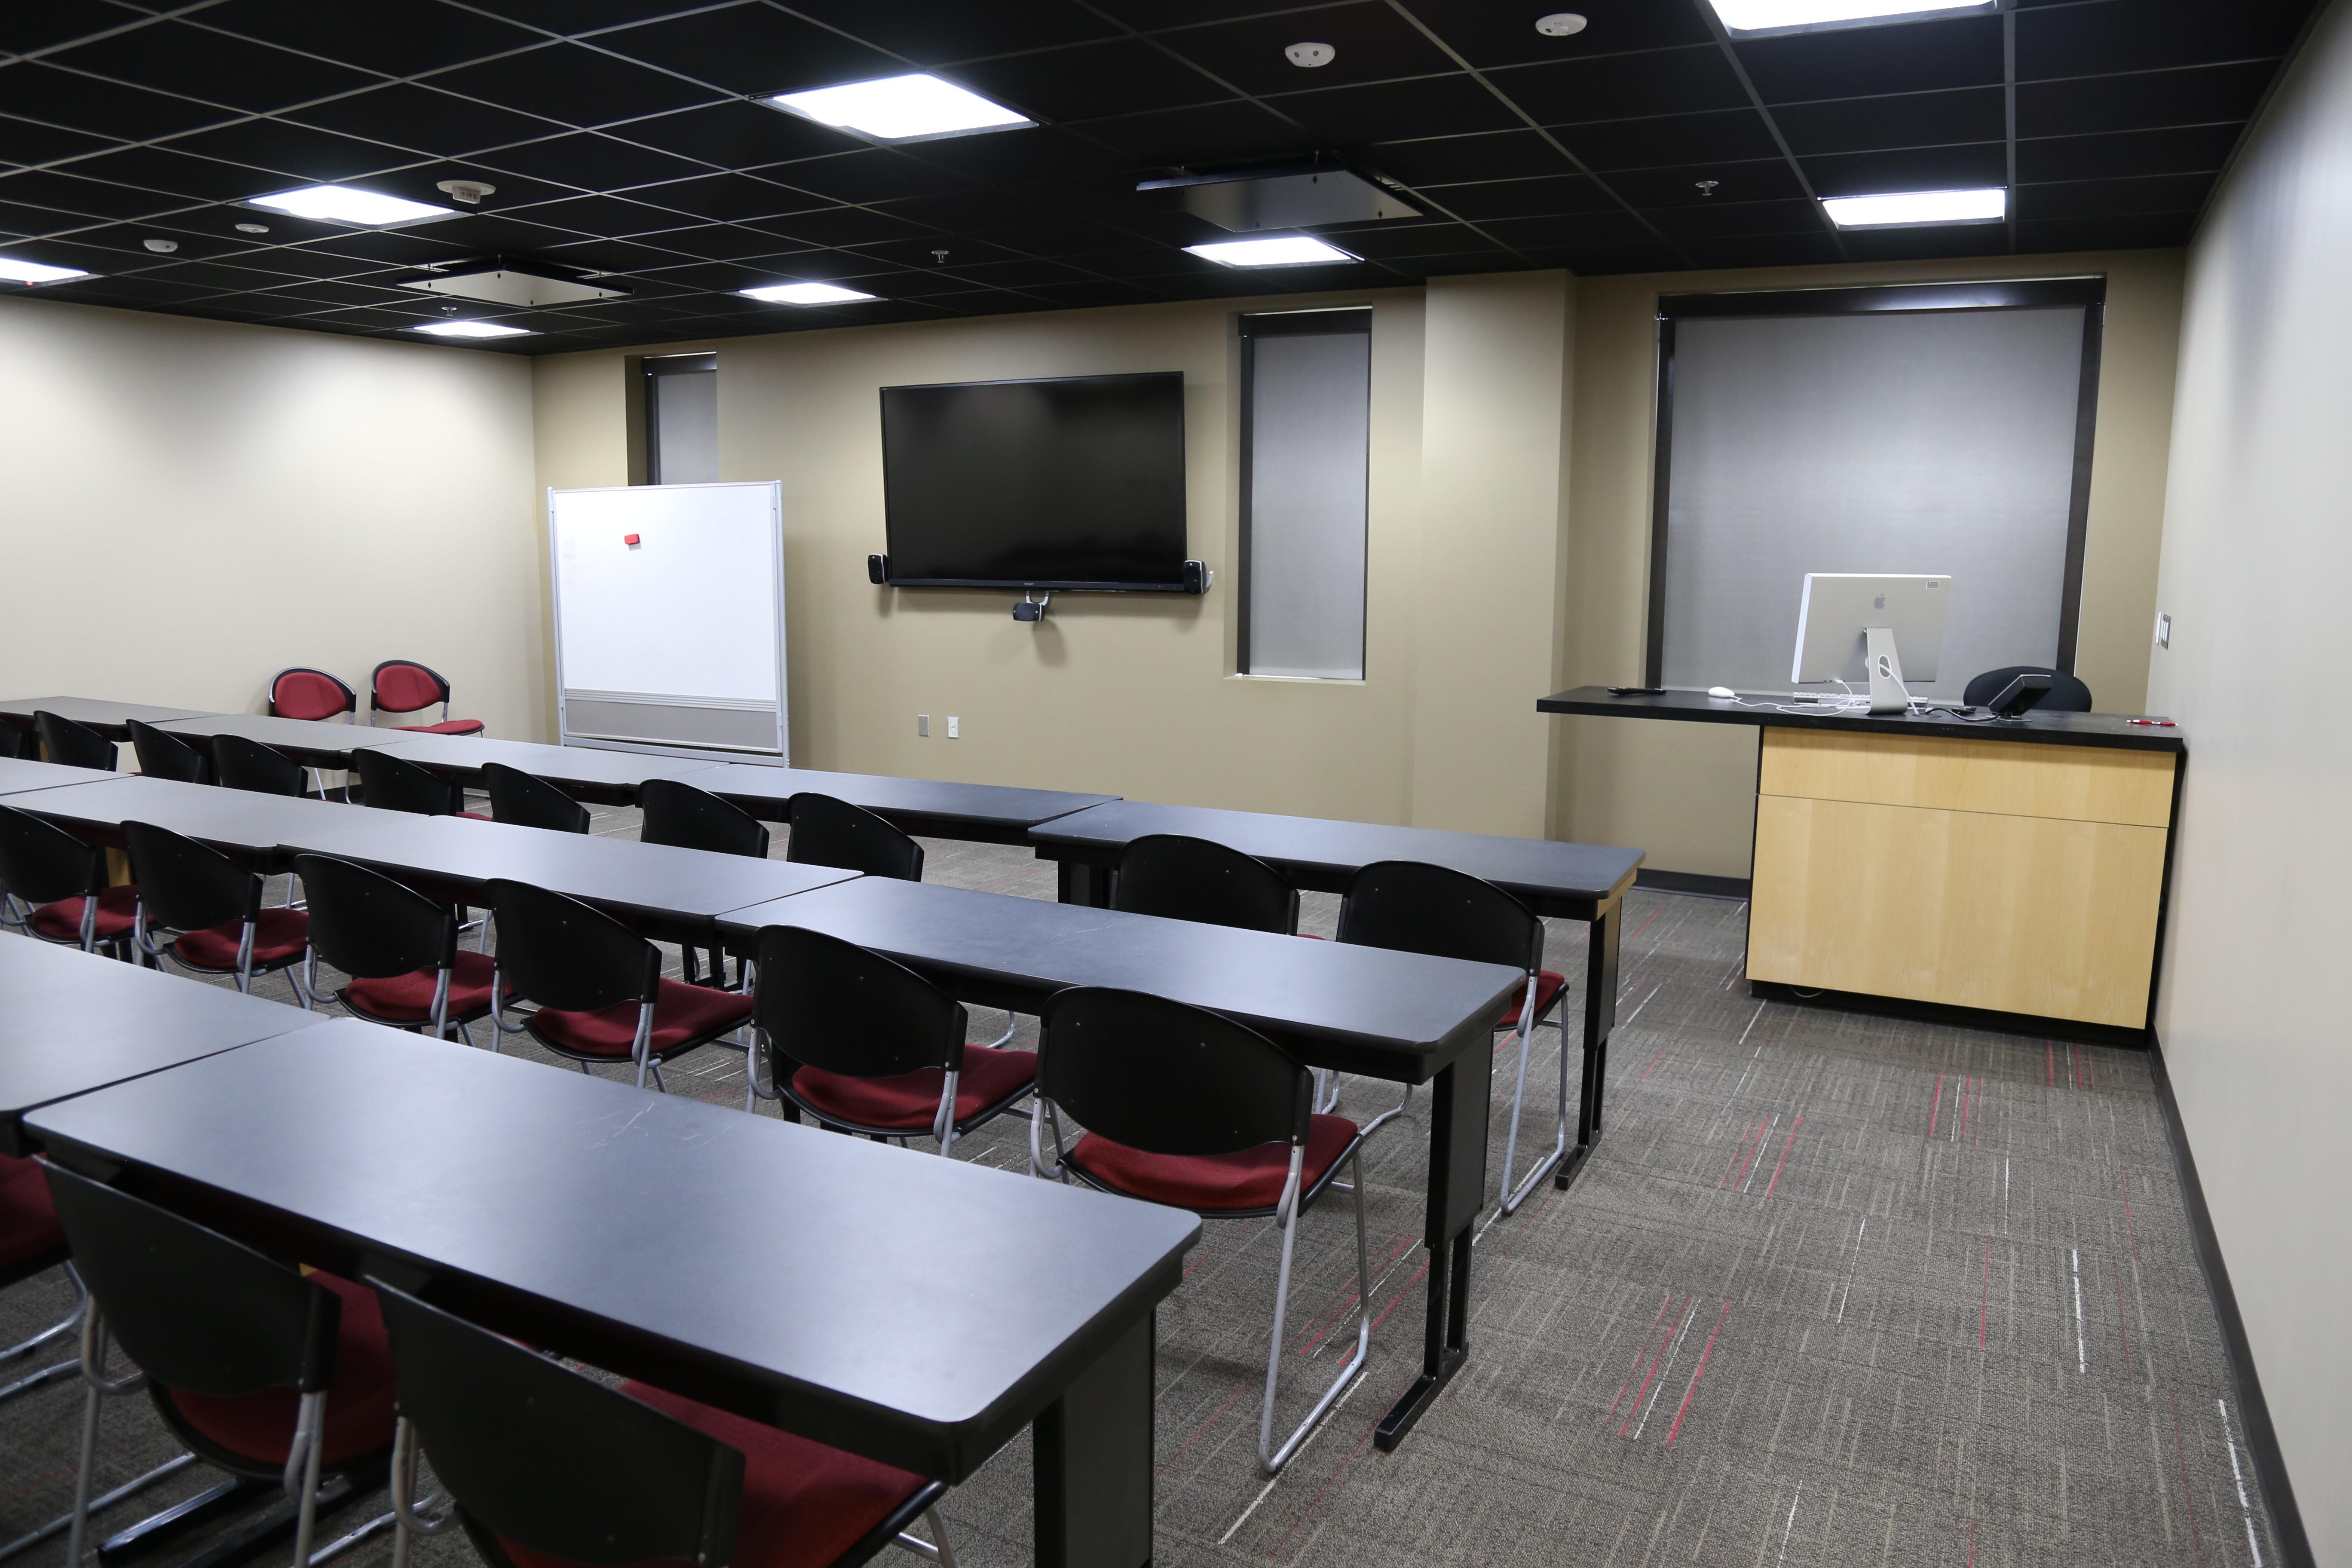 fsu film school renovation digital studio expansion design construction. Black Bedroom Furniture Sets. Home Design Ideas